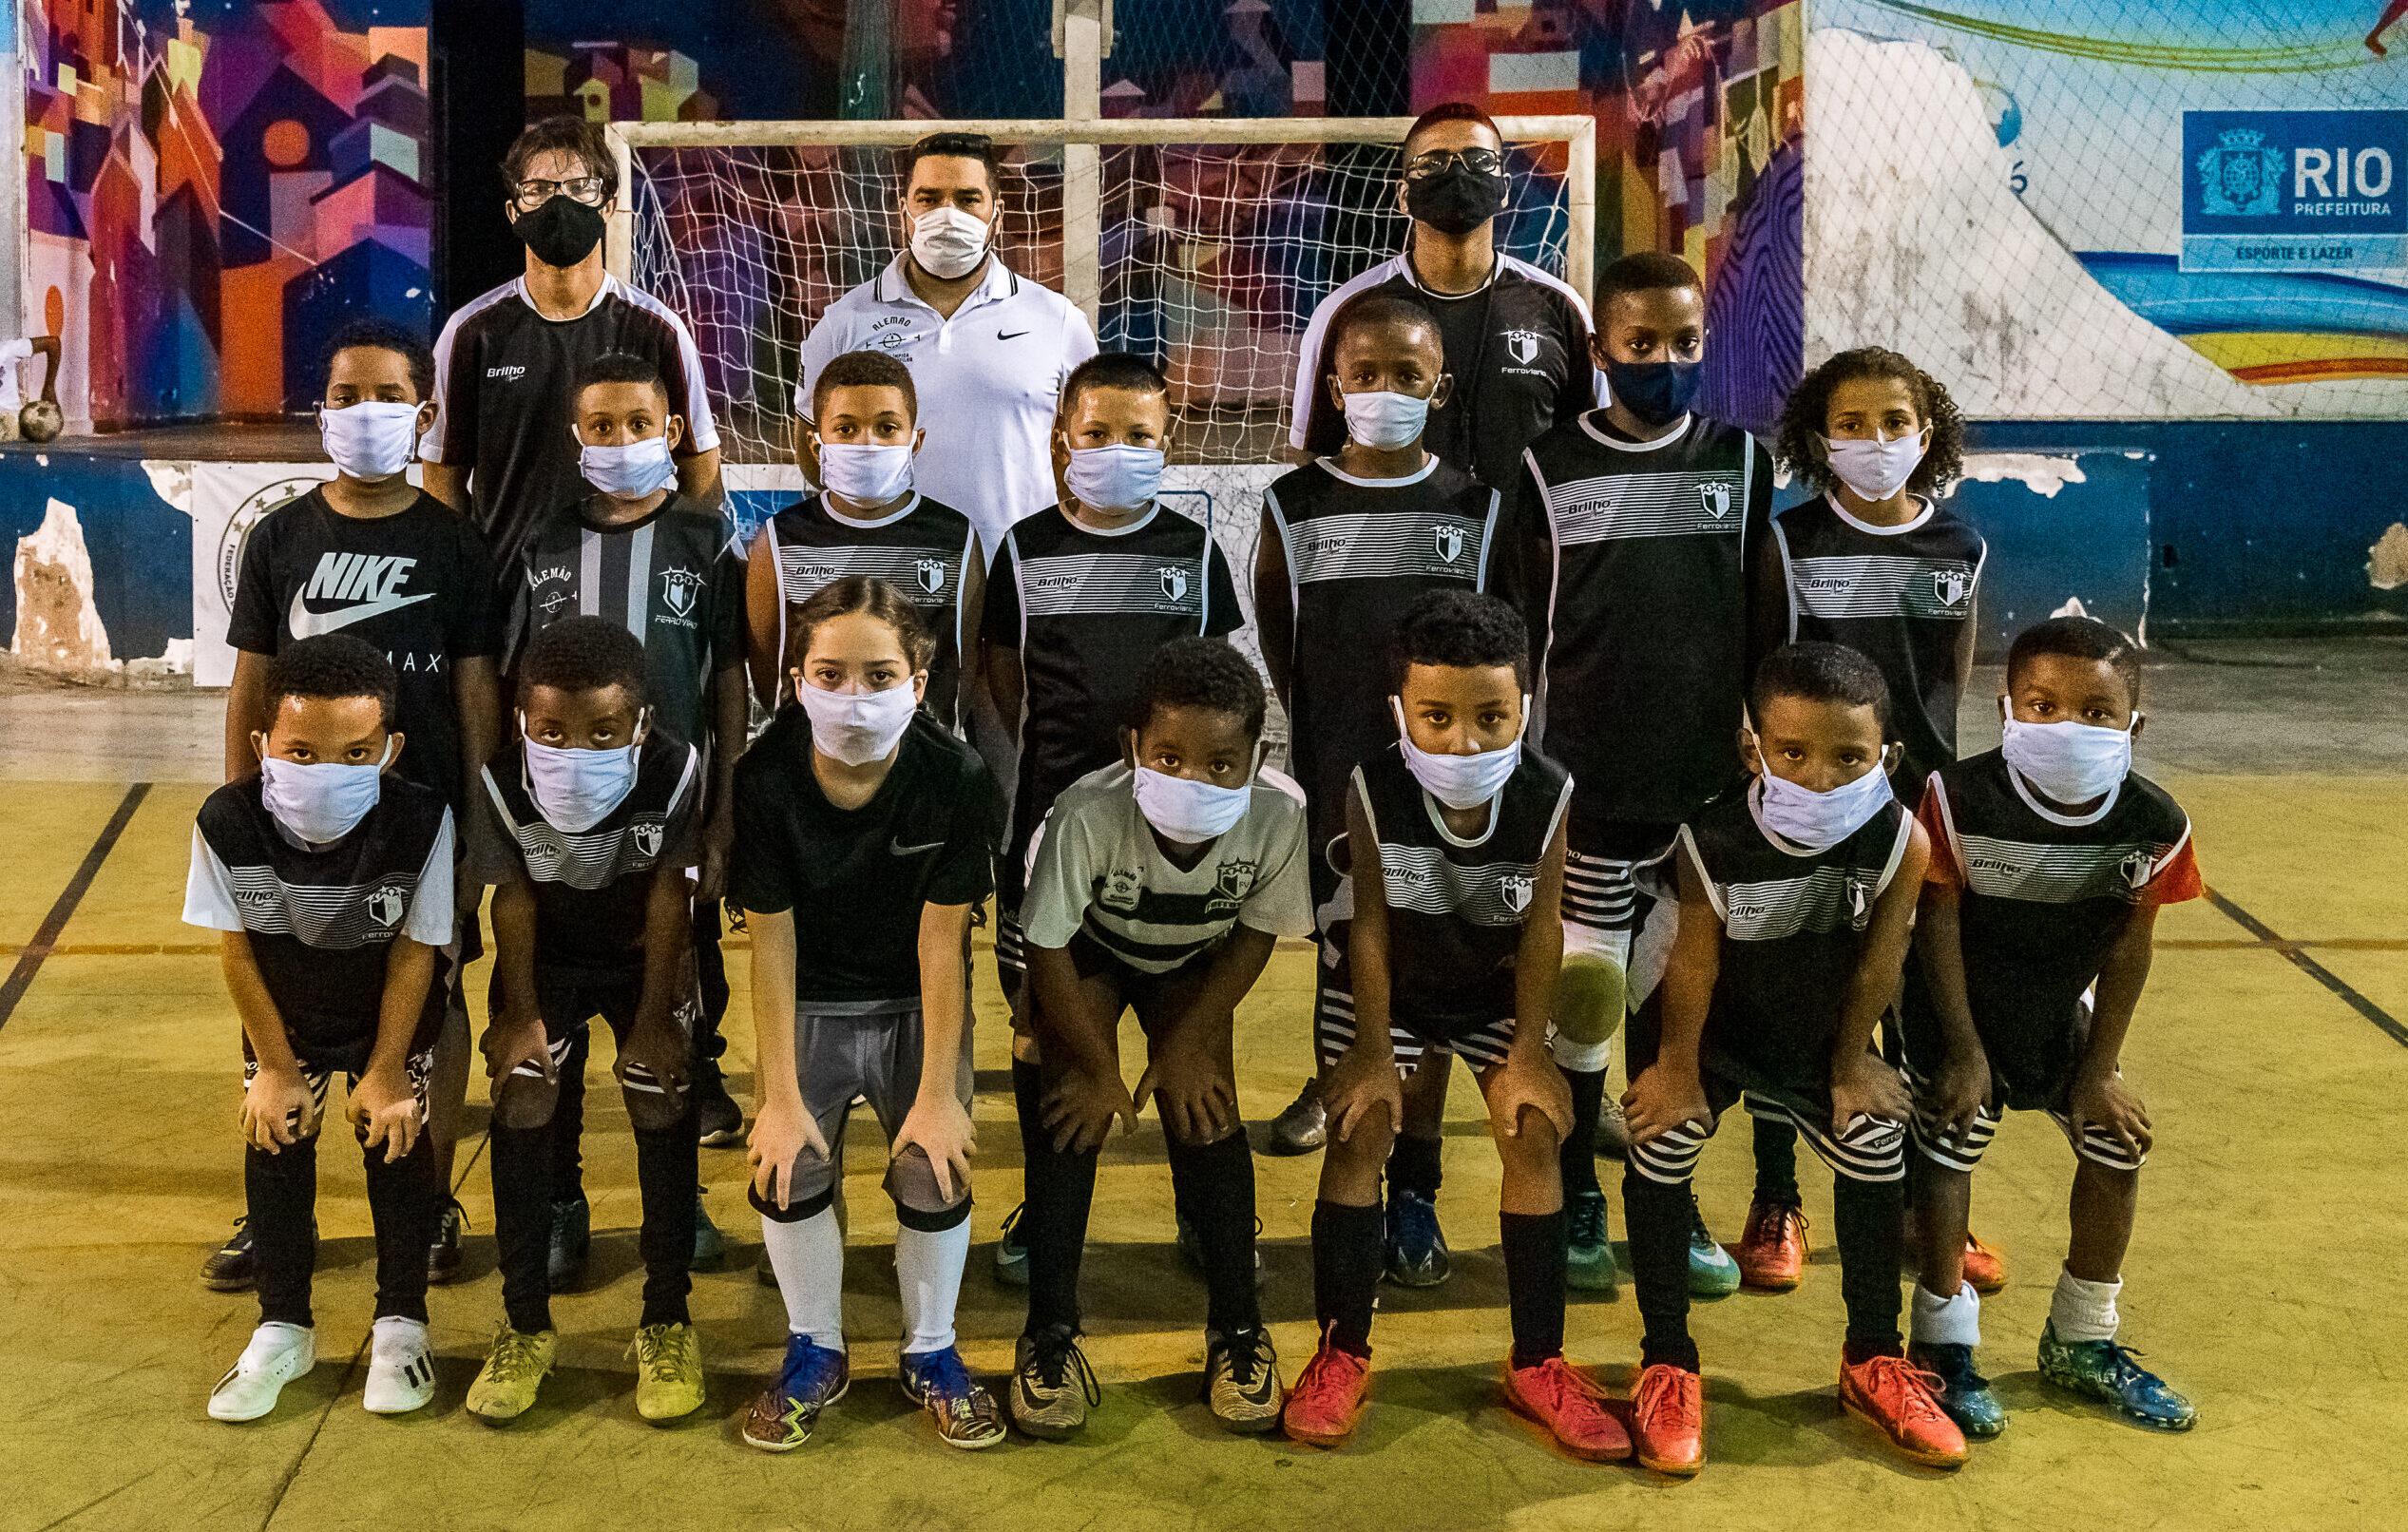 Destaque no futsal do Rio, time sub-9 do Ferroviário busca título carioca